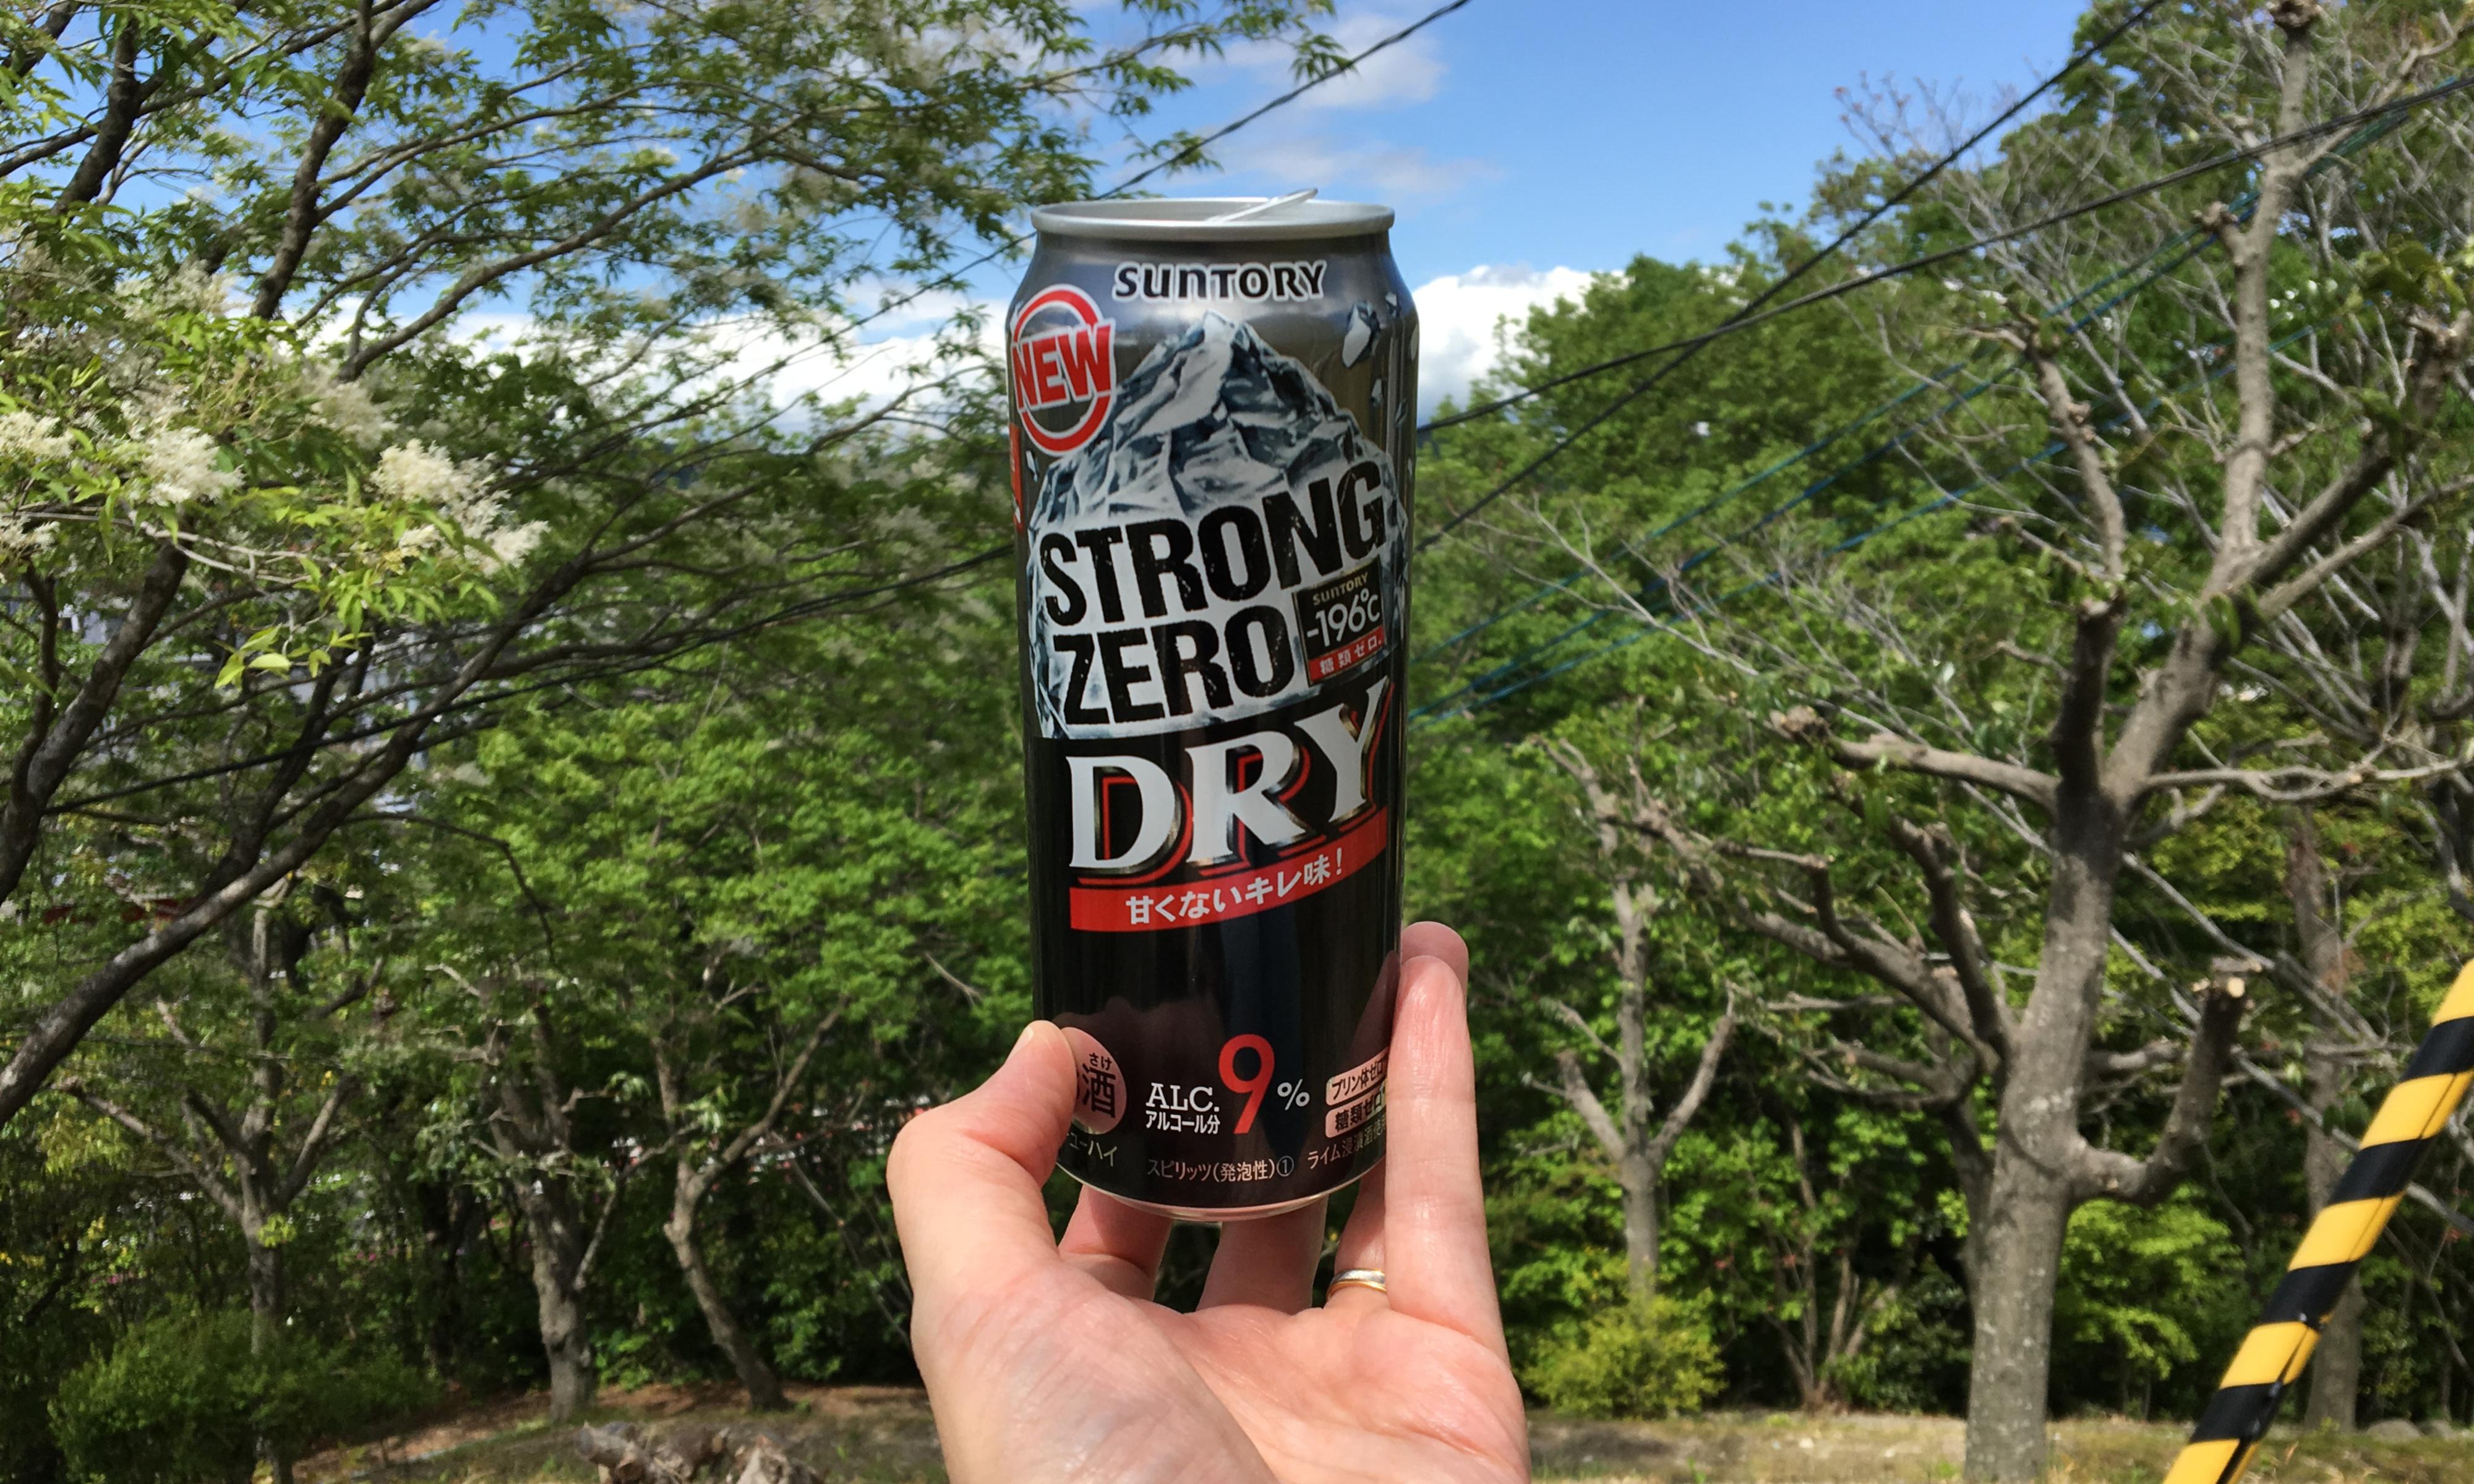 Suntory Strong Zero Dry